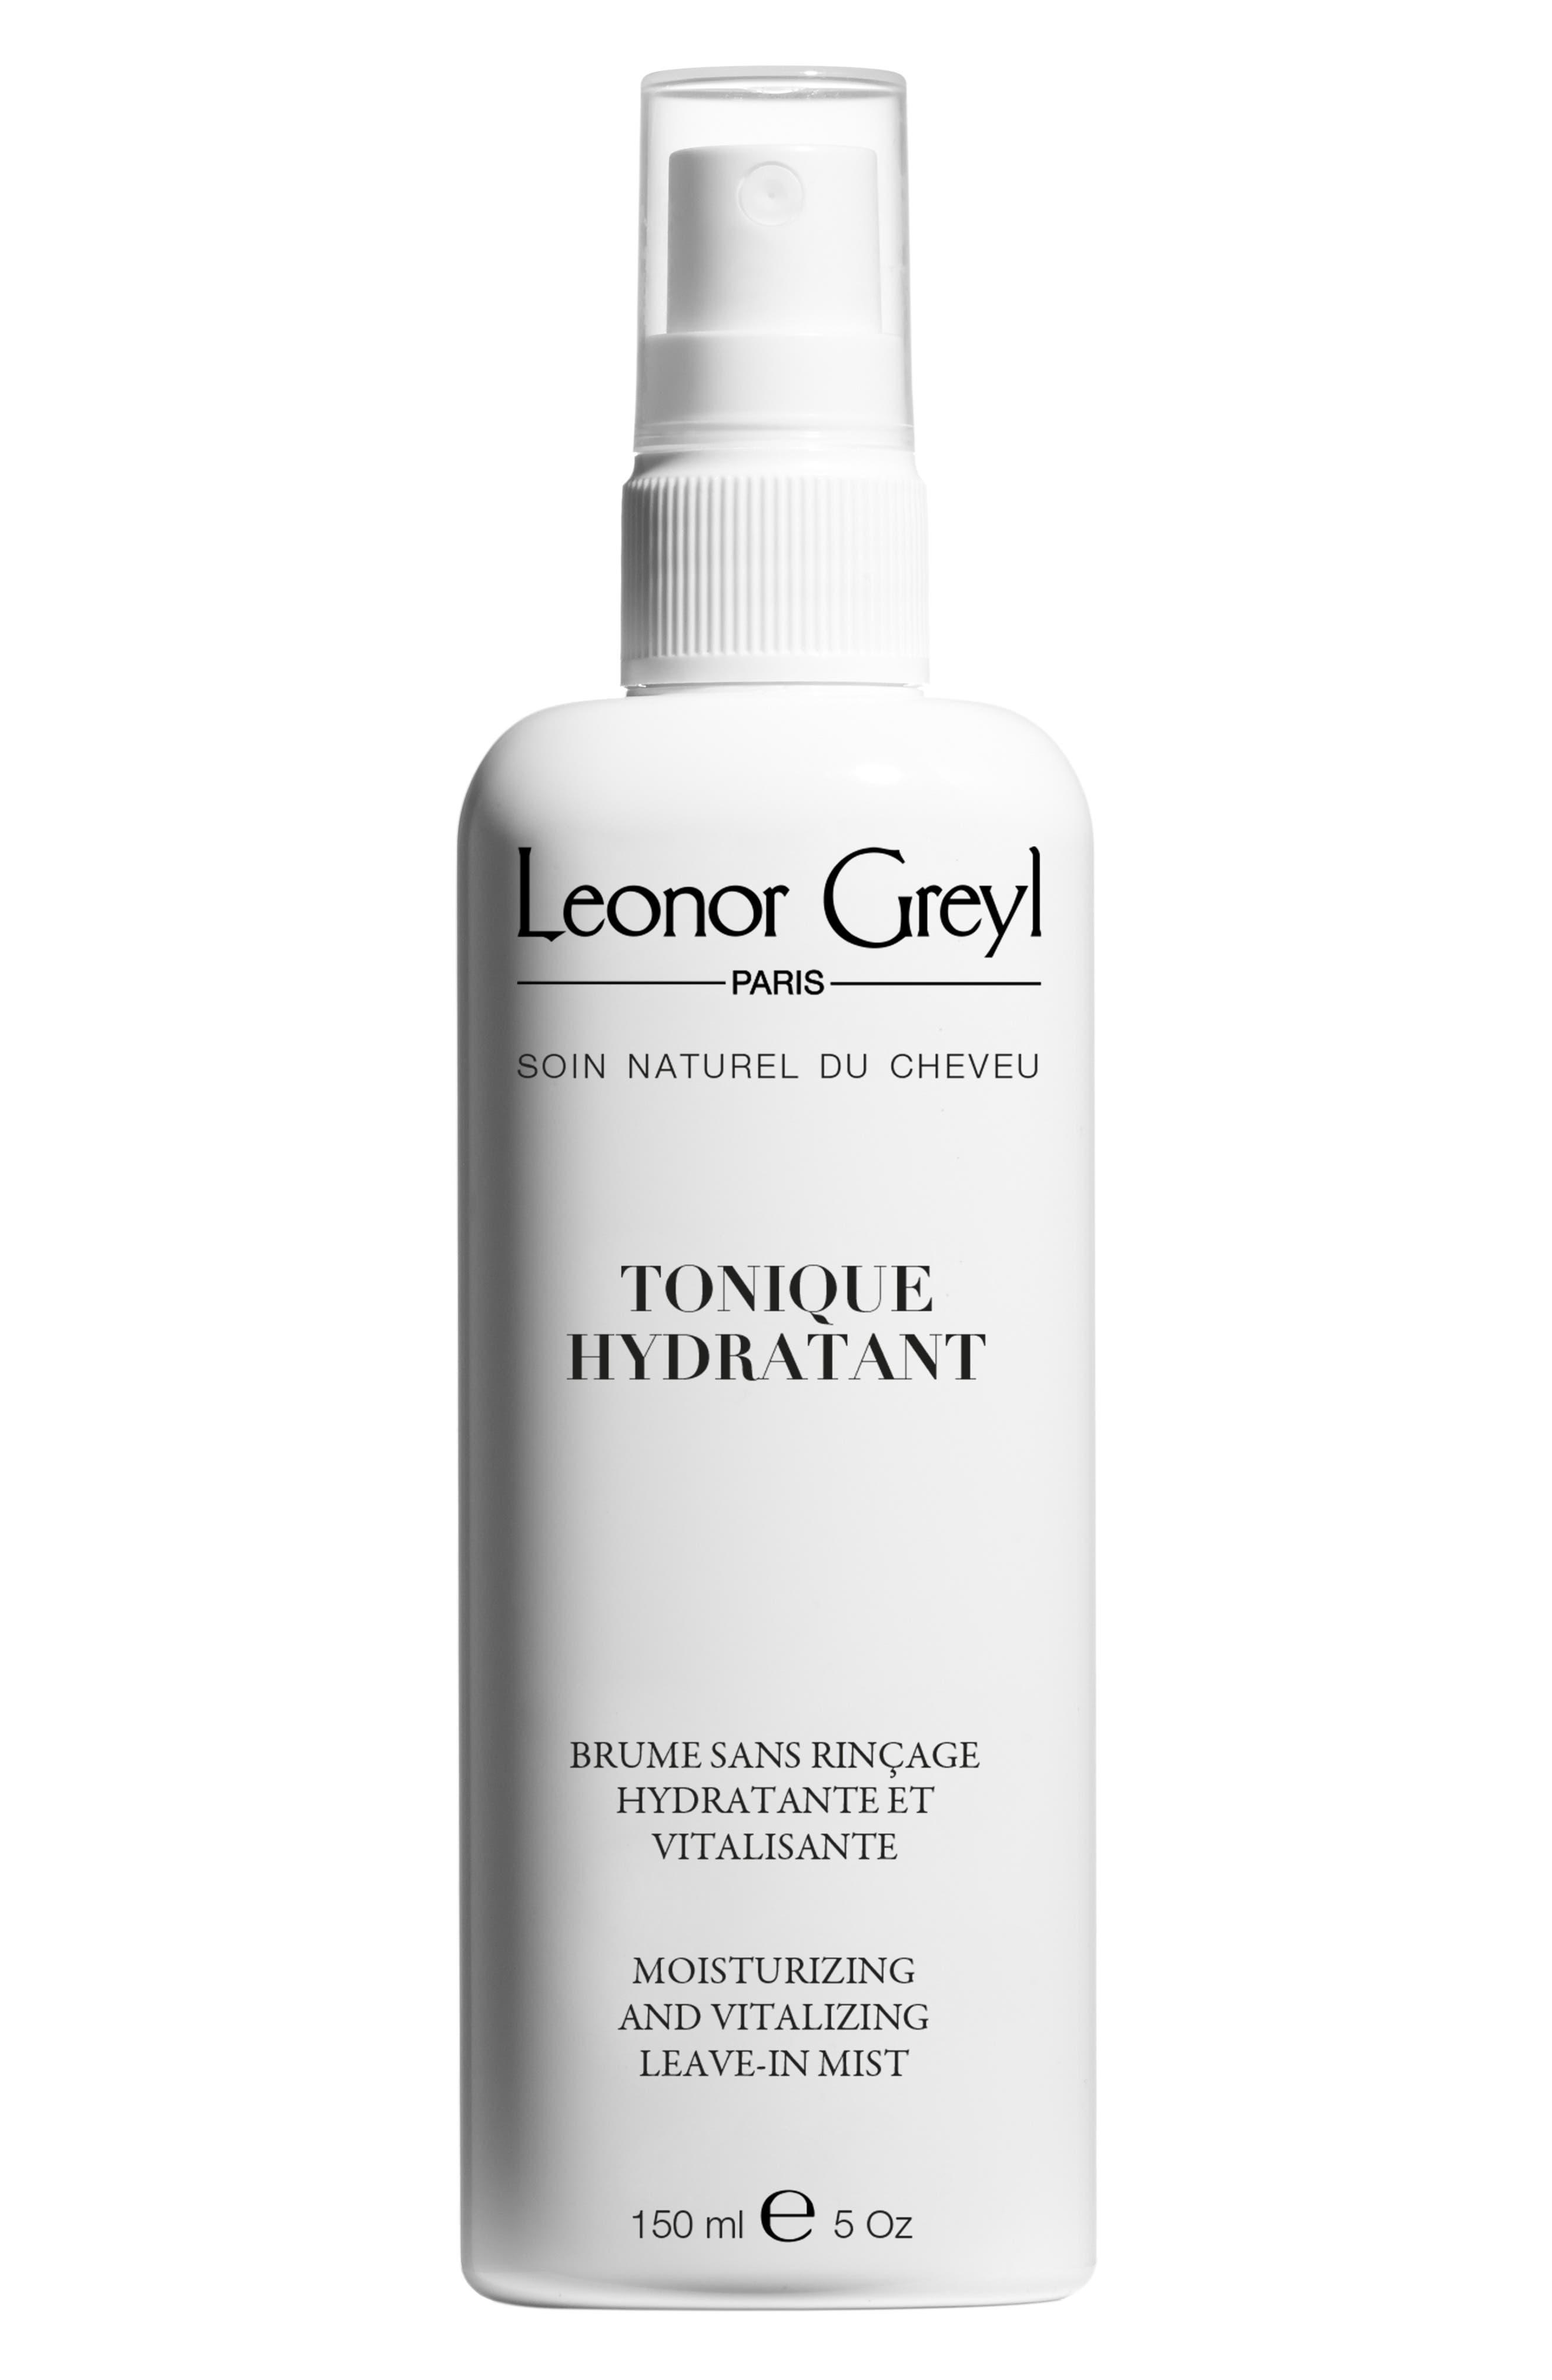 Tonique Hydratant Leave-In Treatment Mist